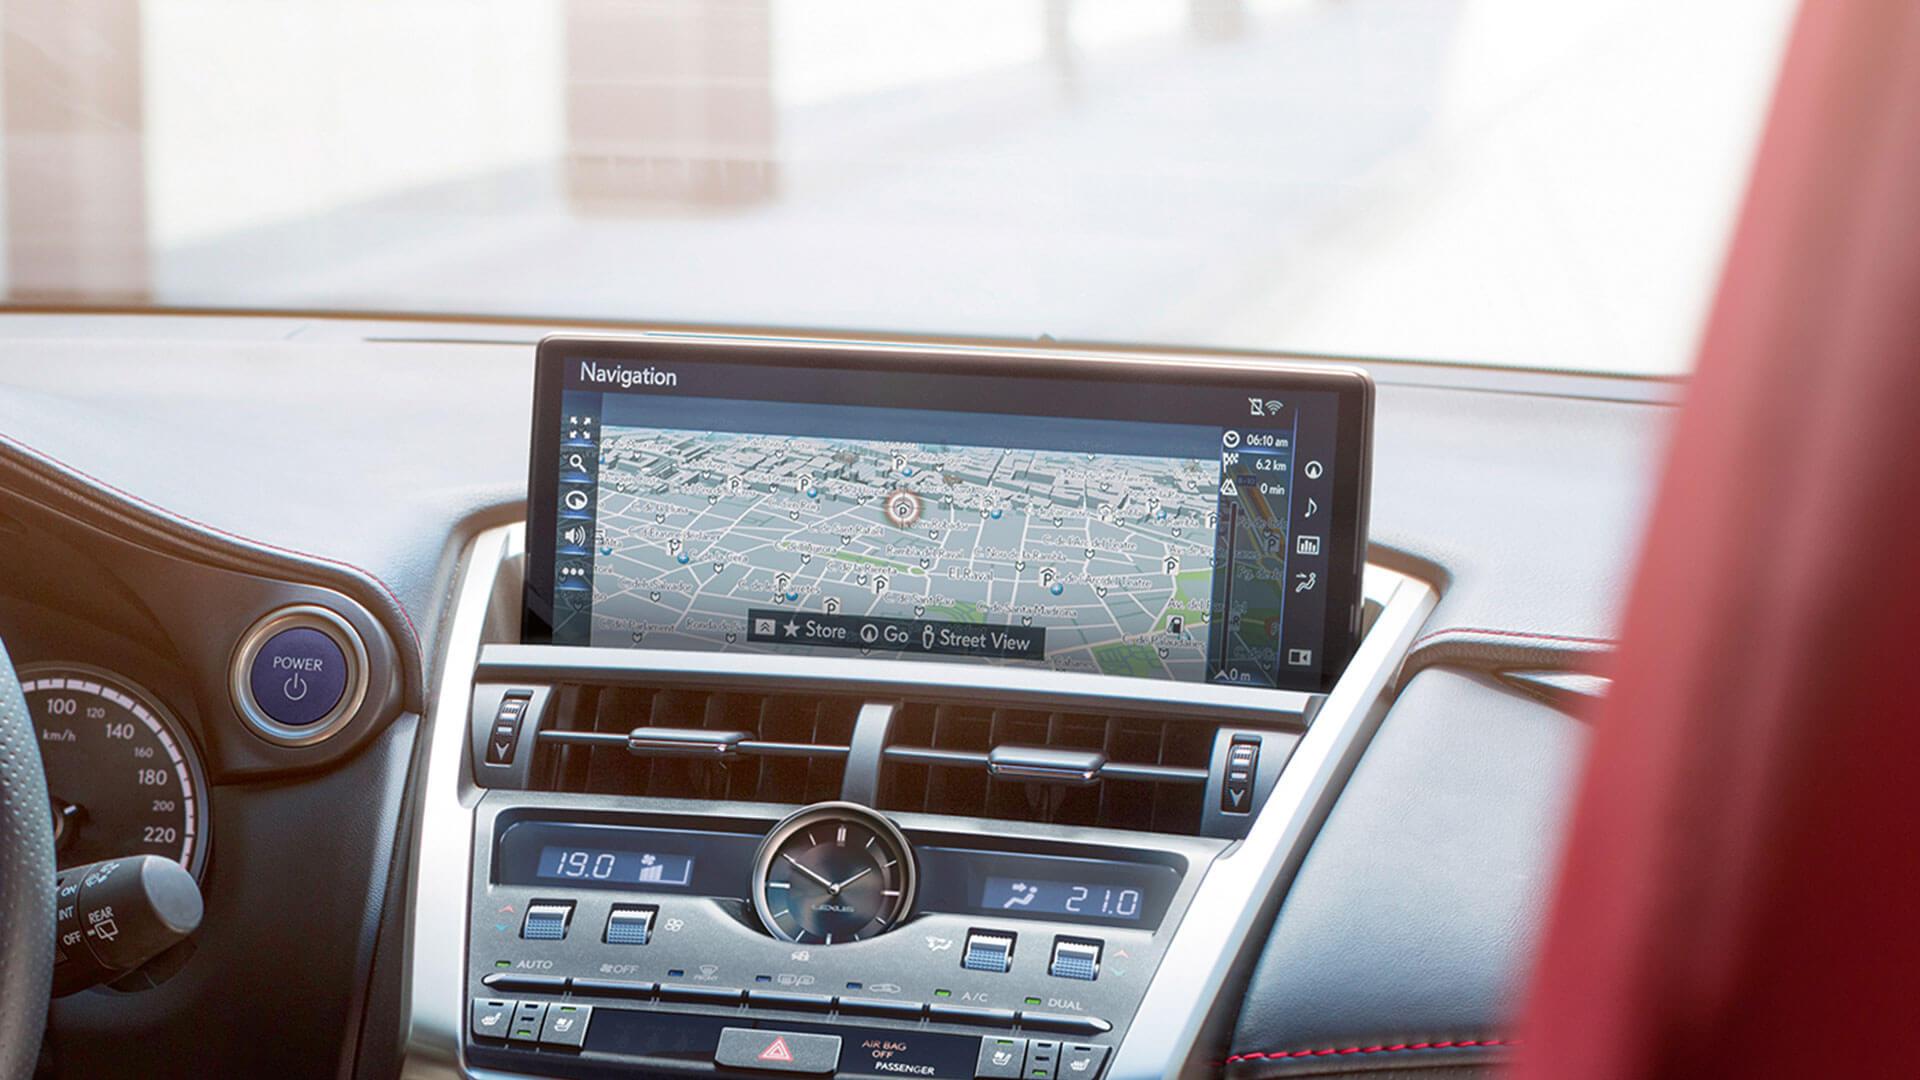 2018 lexus nx my18 features premium navigation